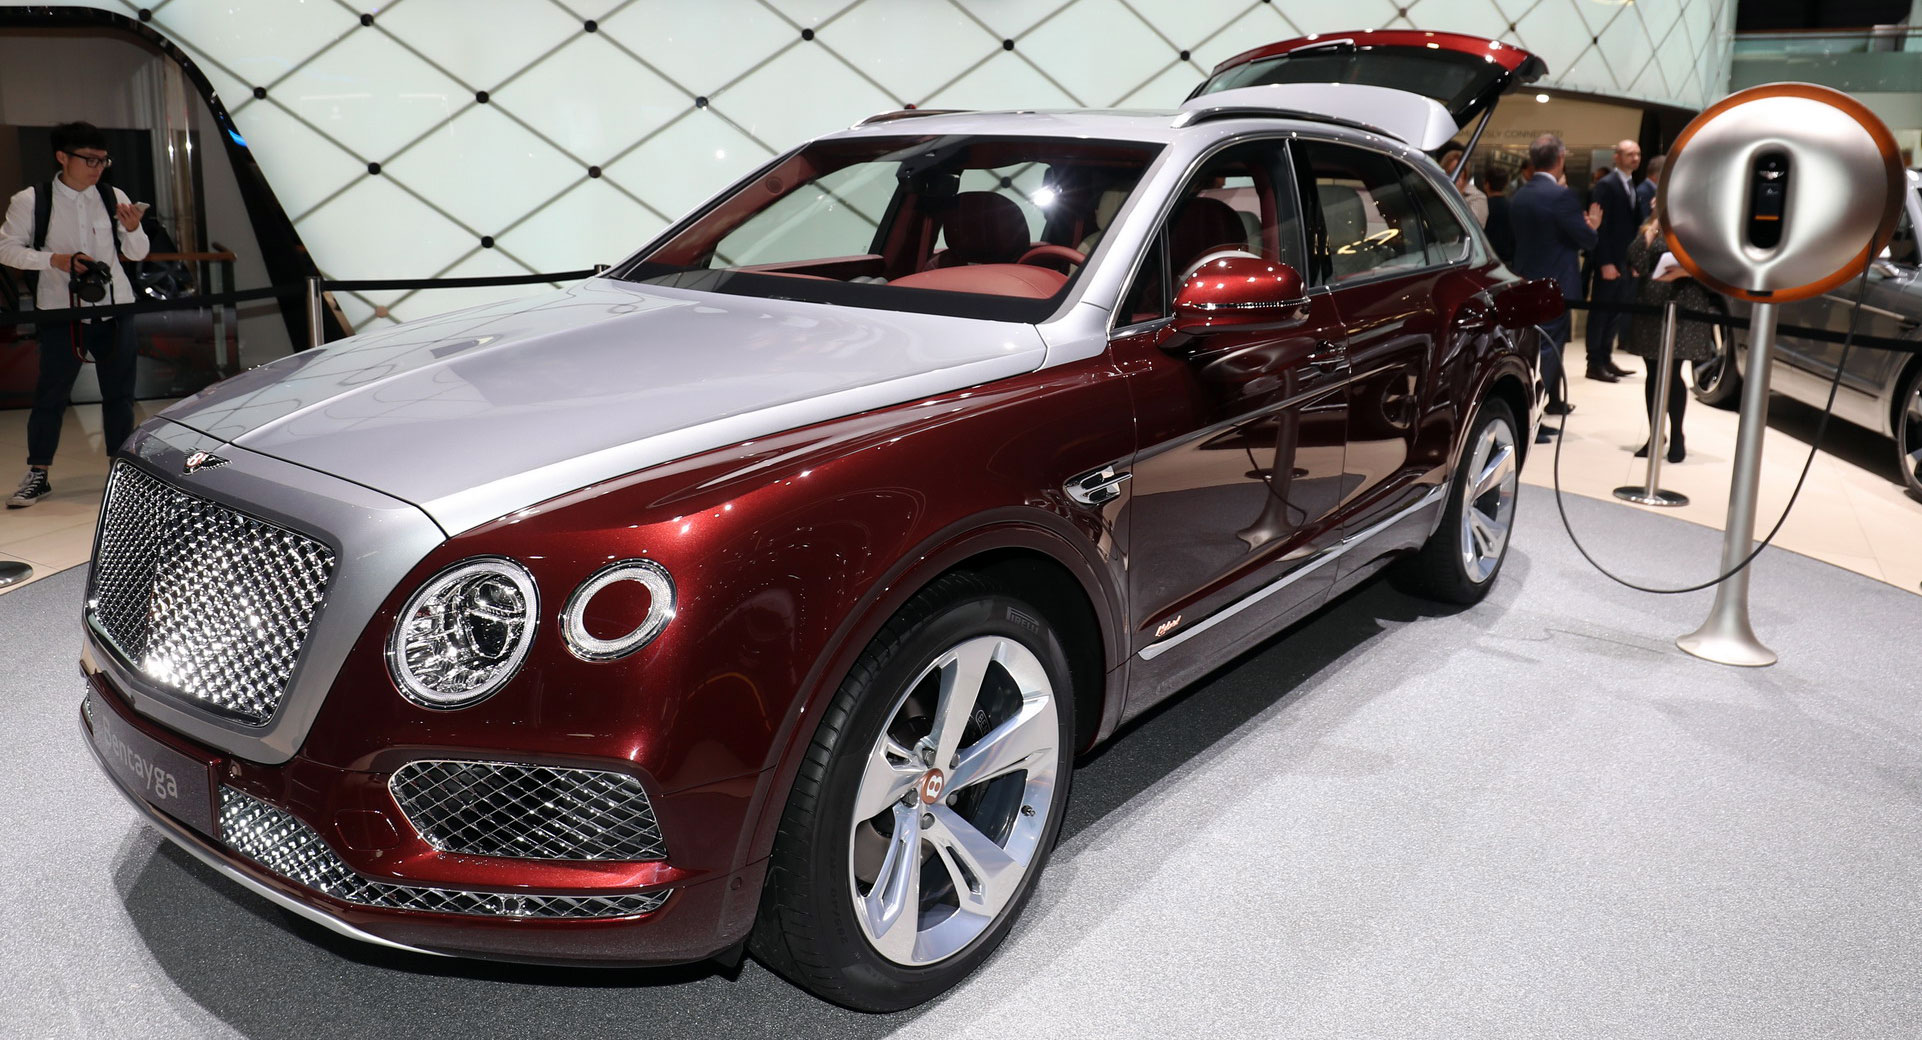 Bentley Tapped Philippe Starck To Design Bentayga Hybrid's